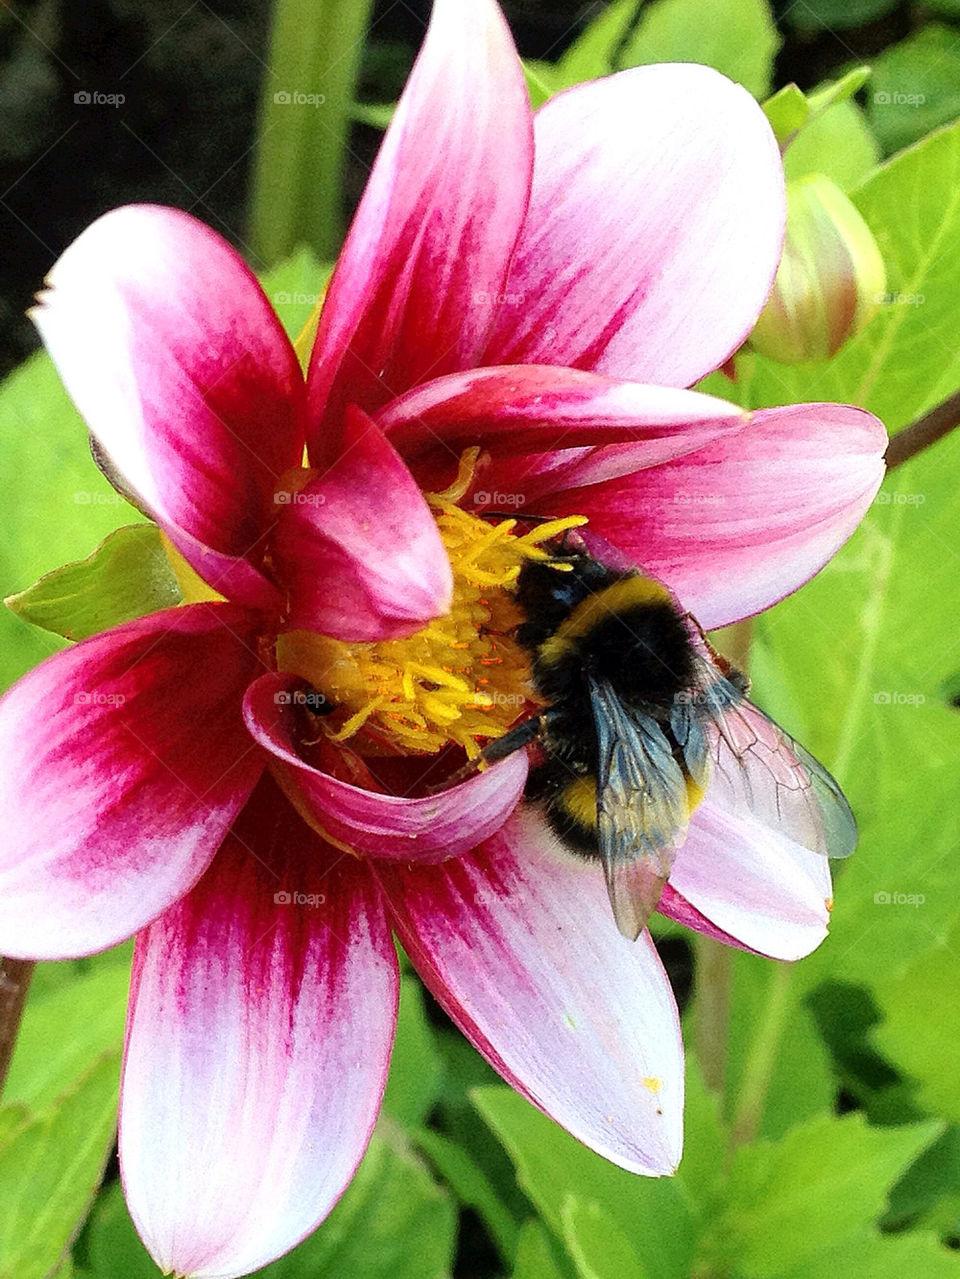 sweden garden flower insect by elluca